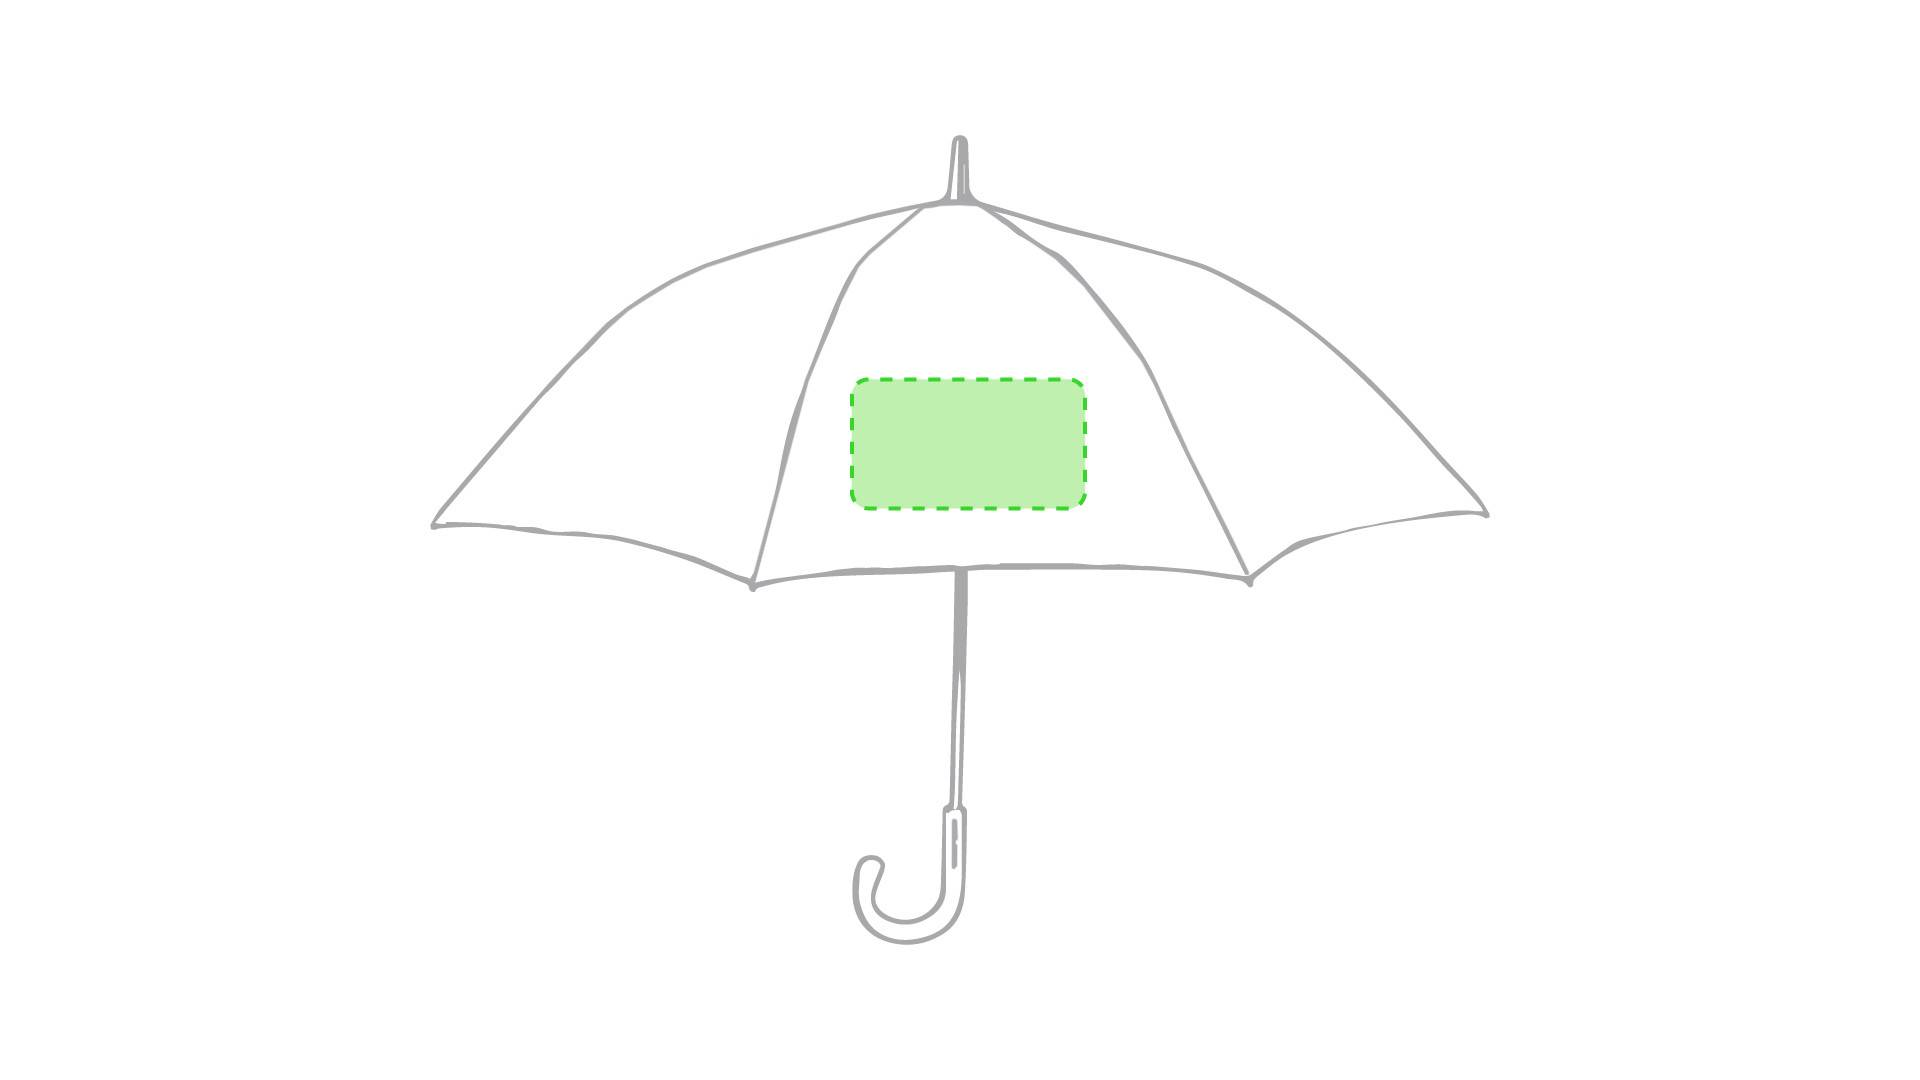 Paraguas automático de colores 1